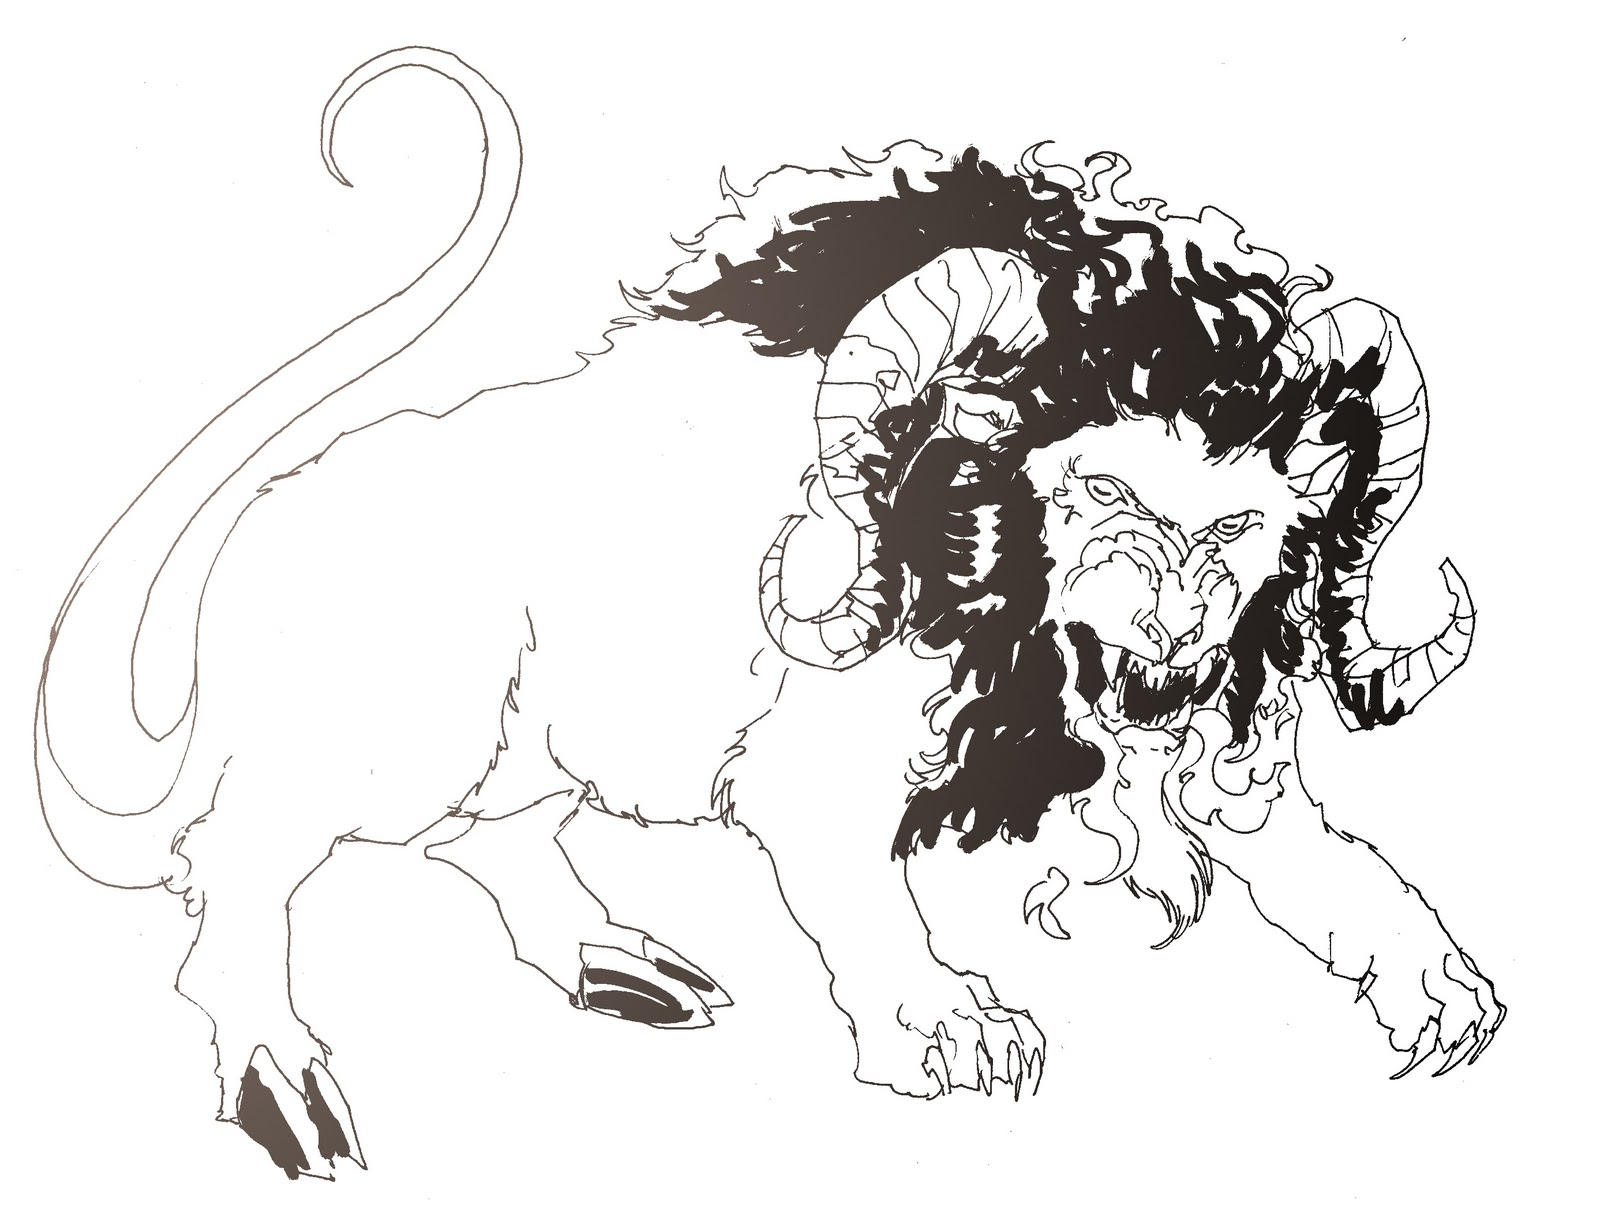 Chimera Greek Mythology Drawing my Chimera And The Greek